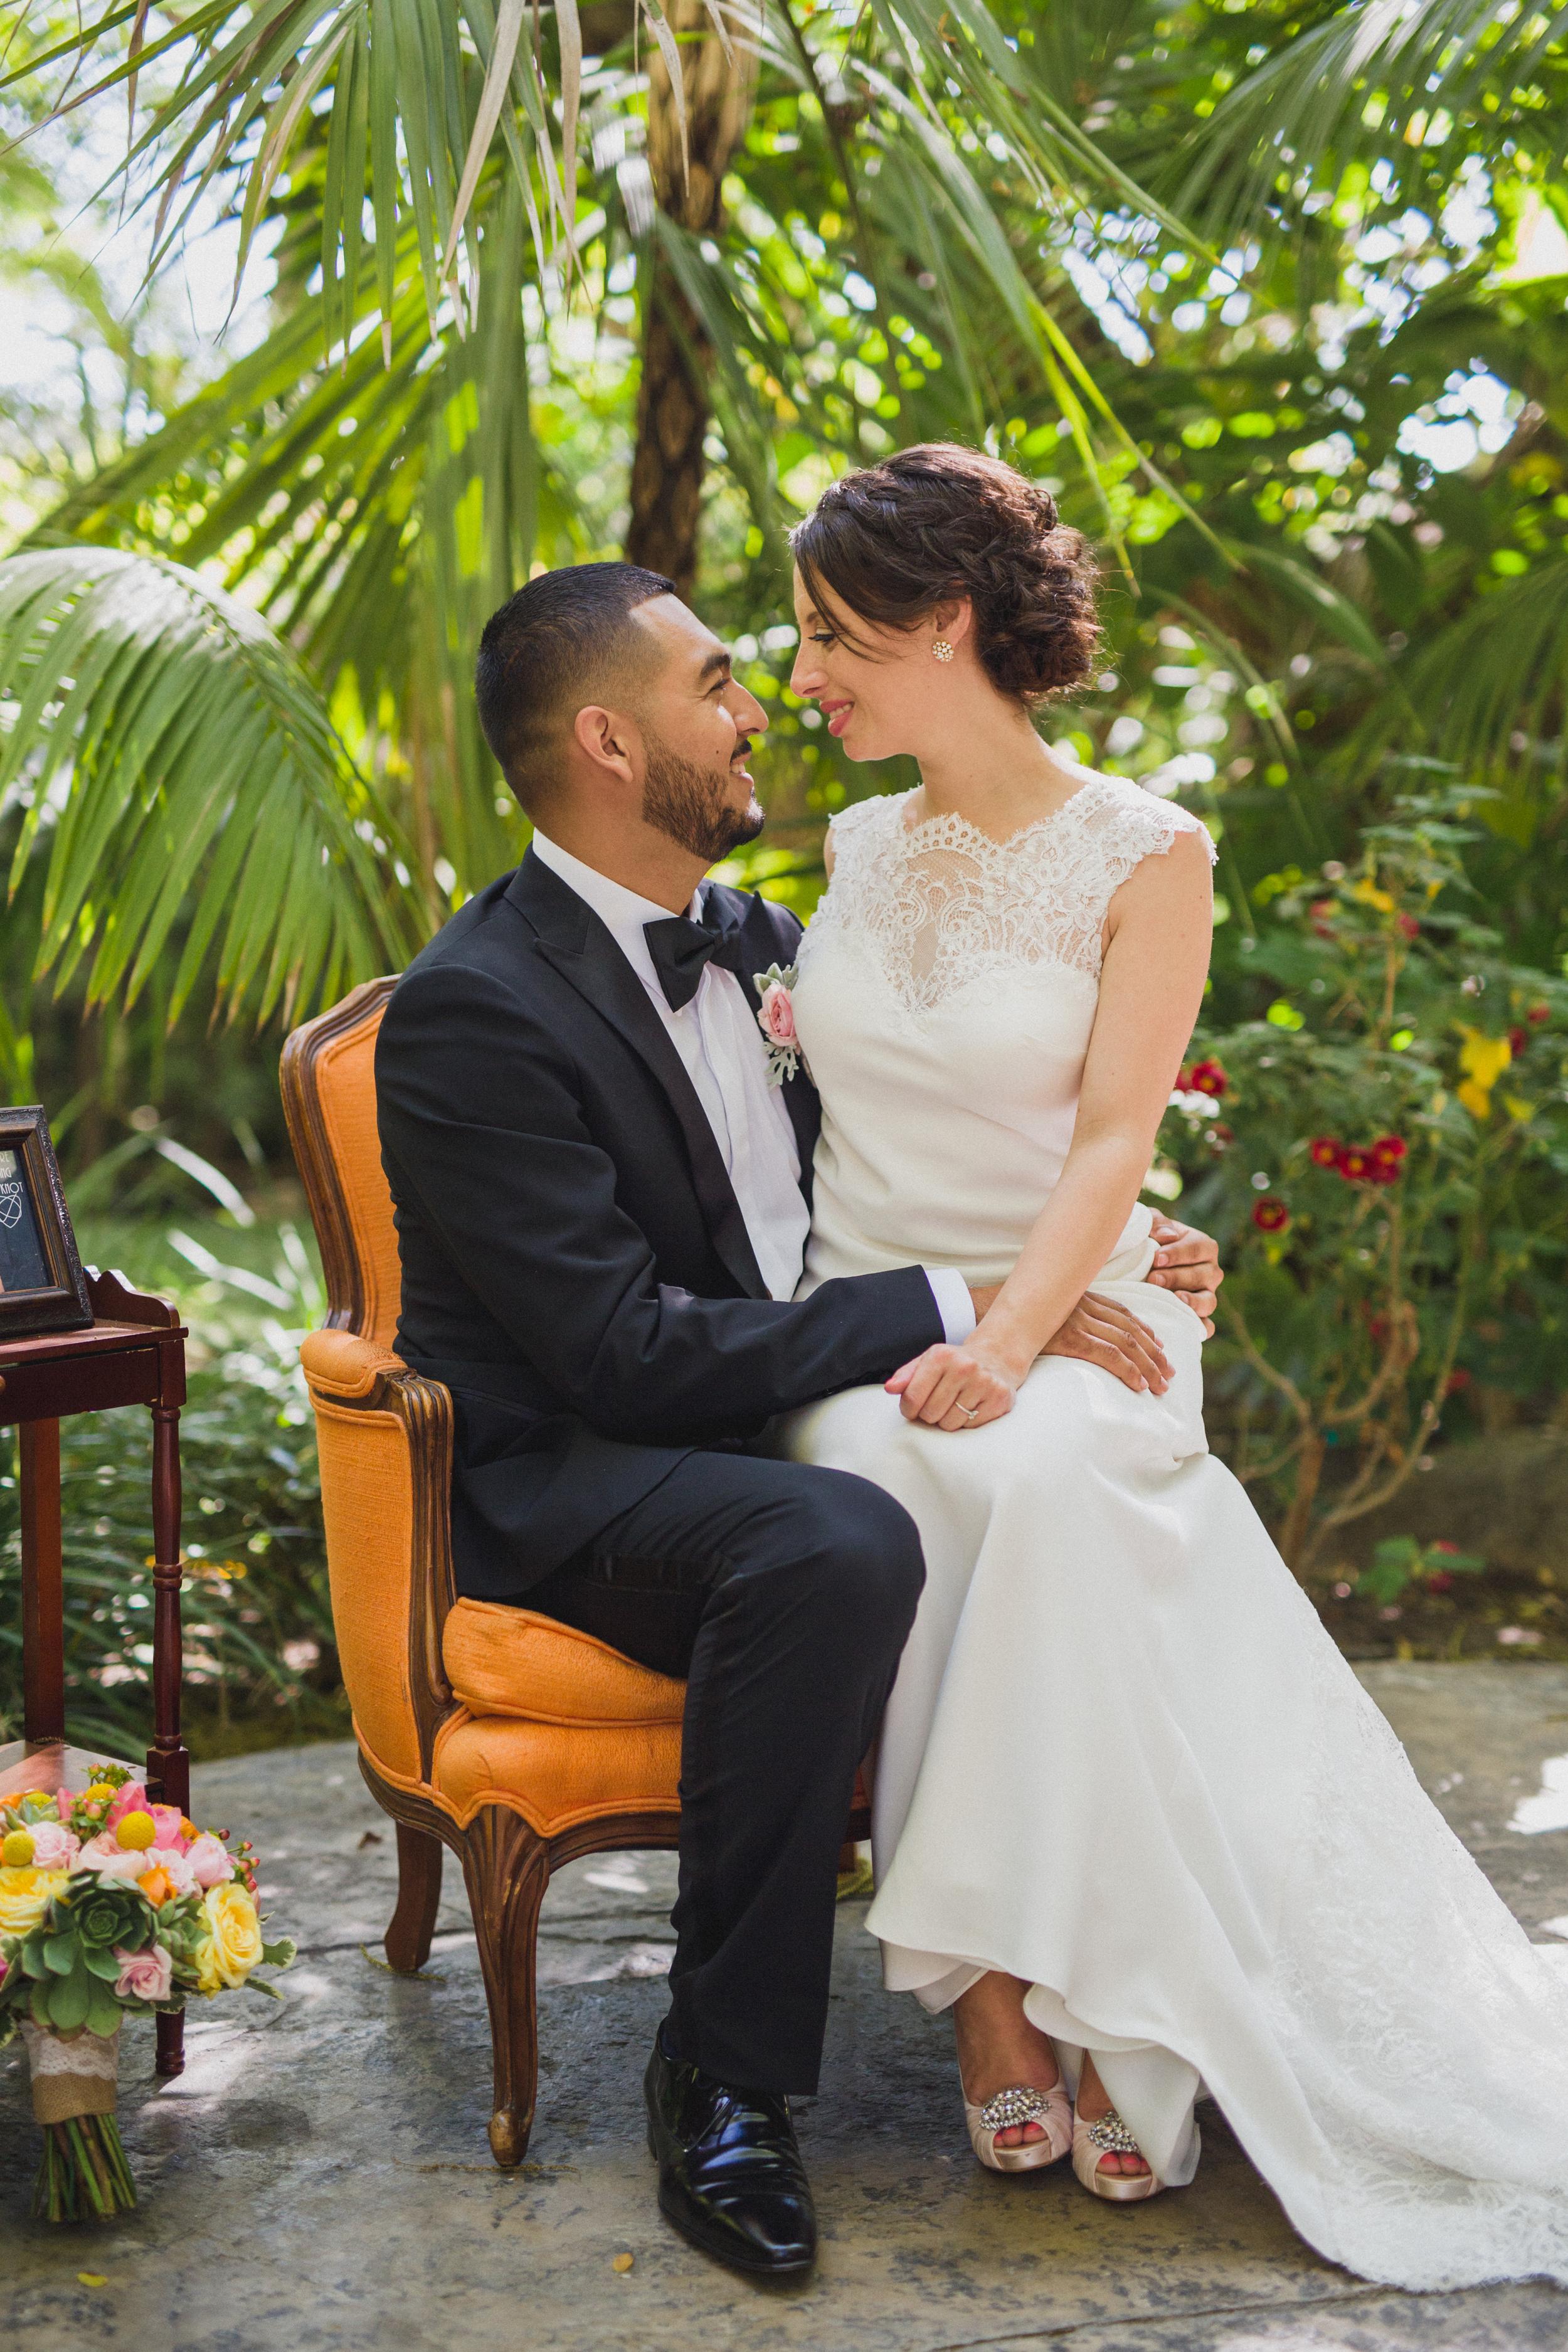 036 Hartley Botanica Wedding Photography Cotton Love Studios.jpg